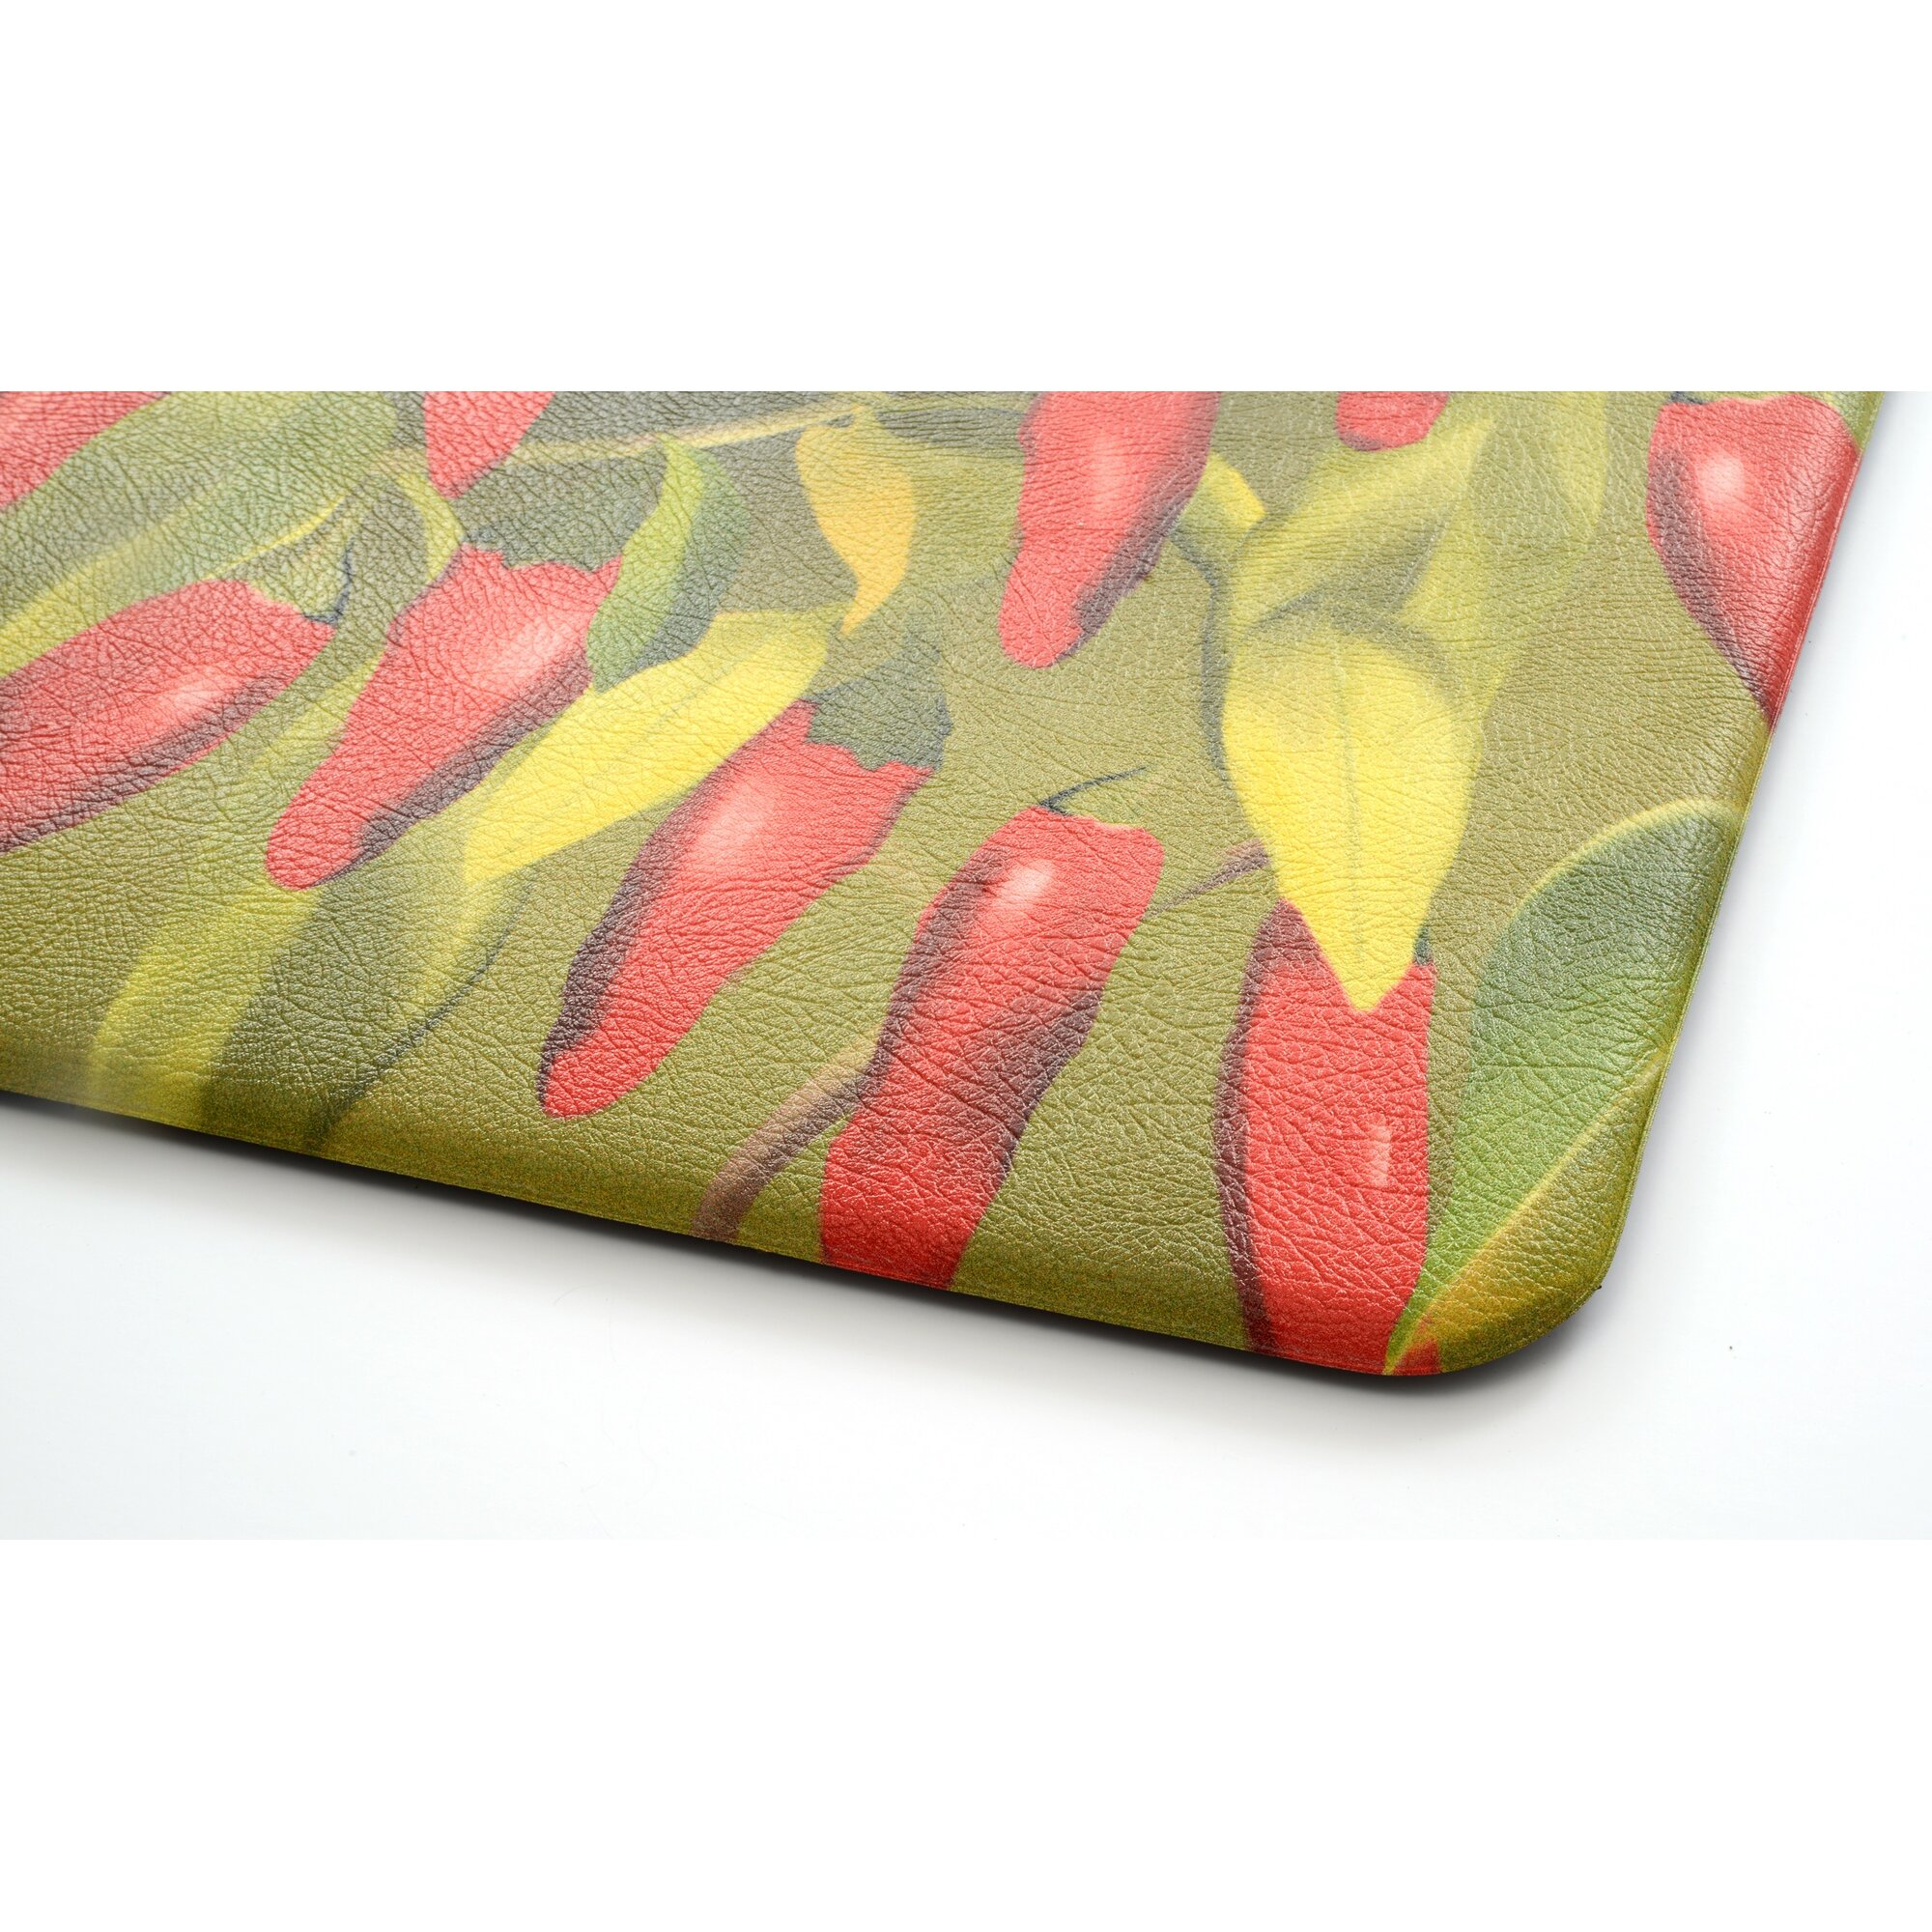 Kitchen Rugs Chili Peppers Kitchen Design .